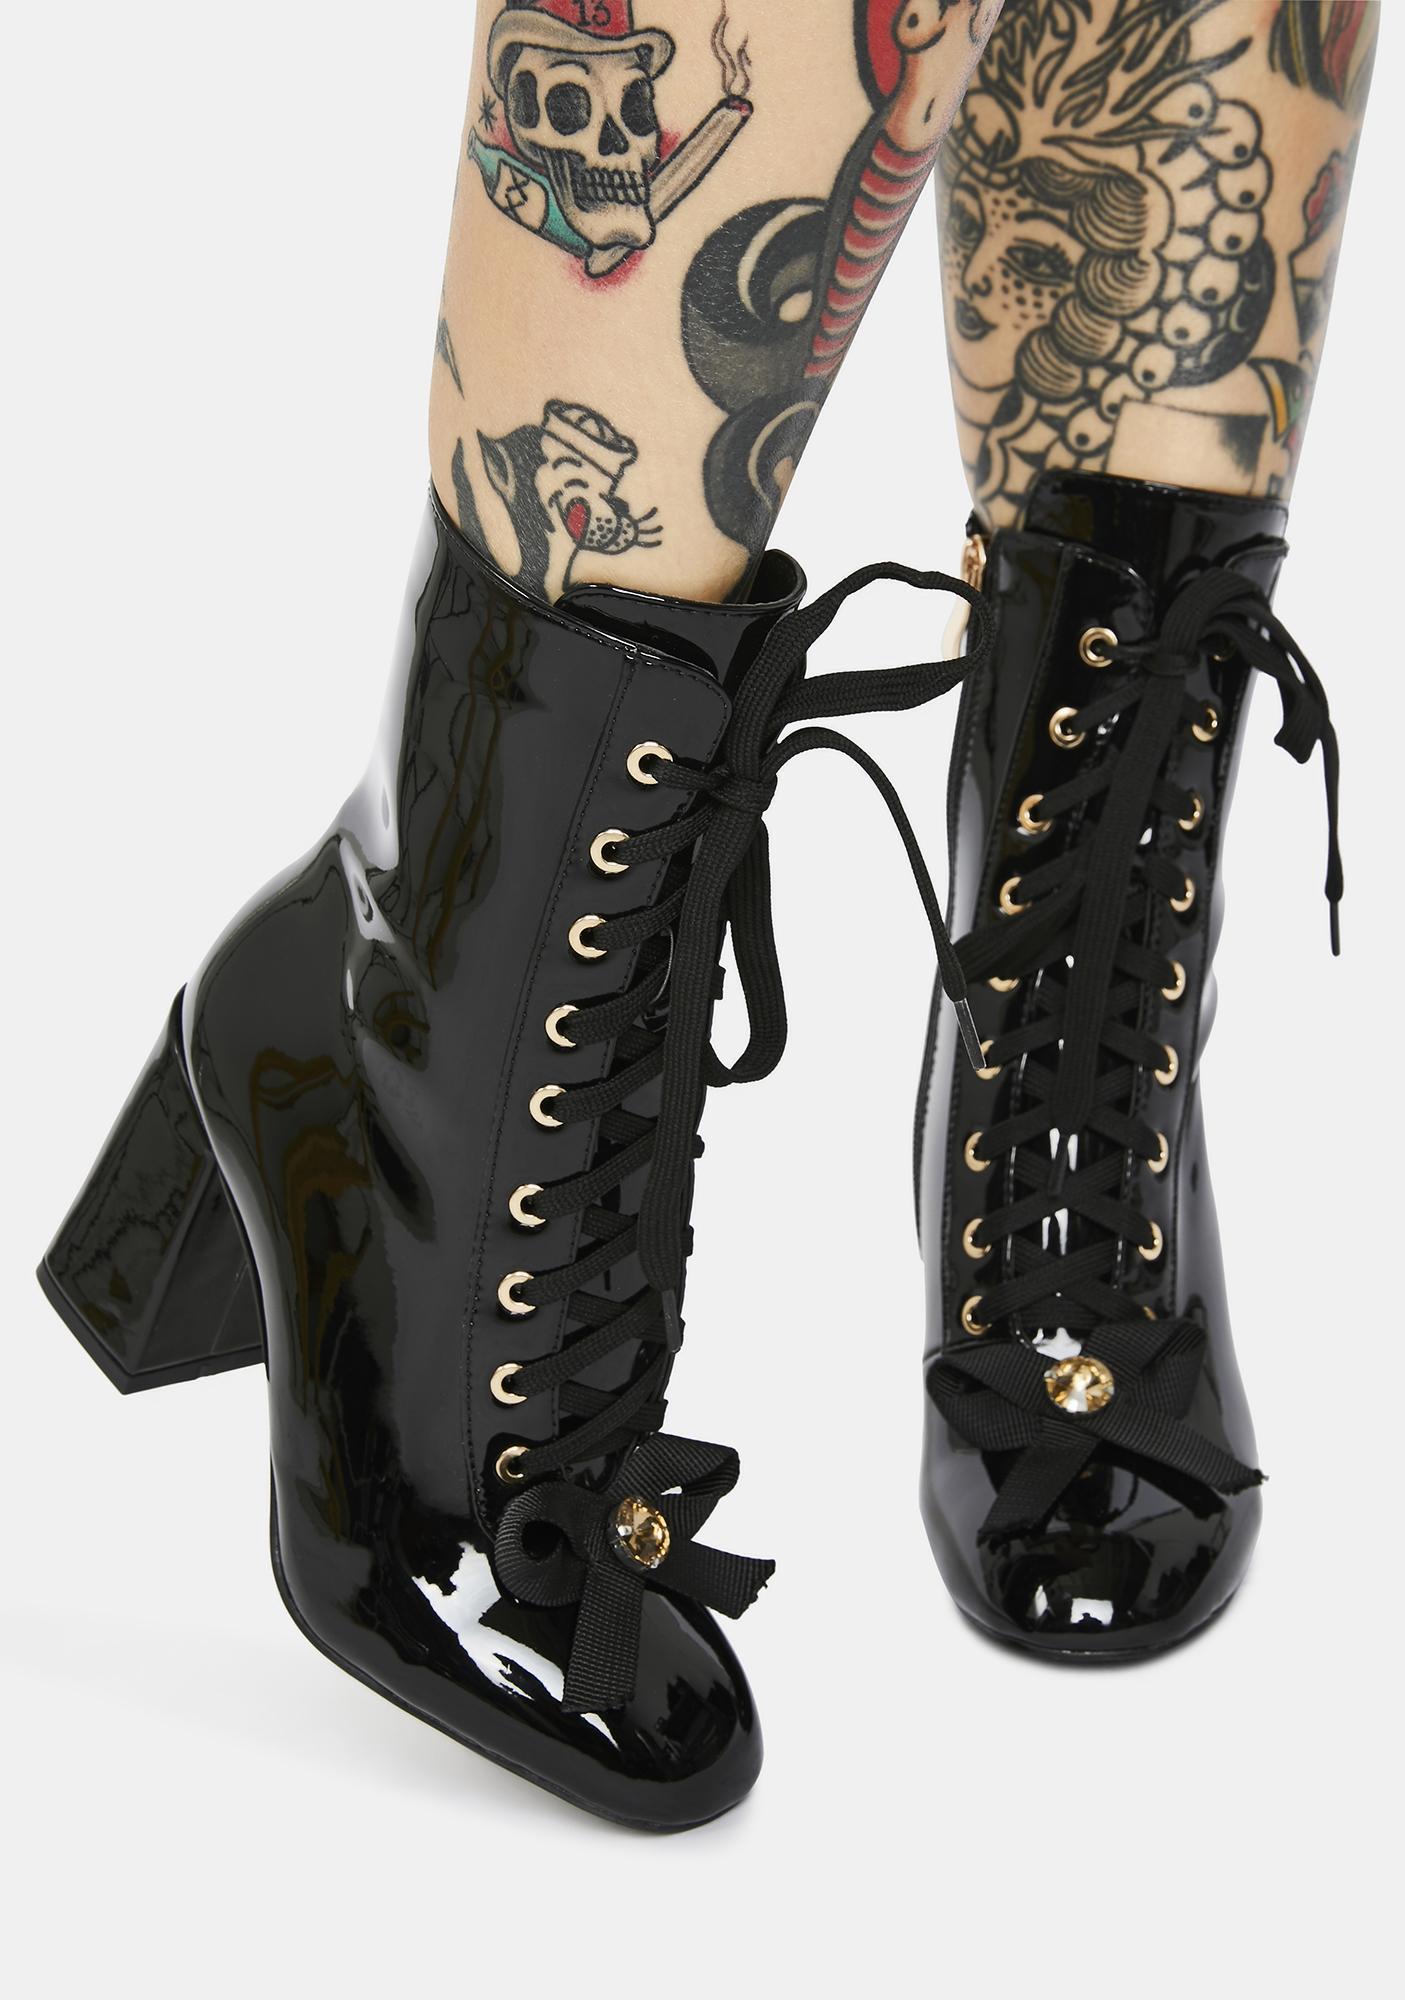 AZALEA WANG Black The One I Want Lace Up Boots